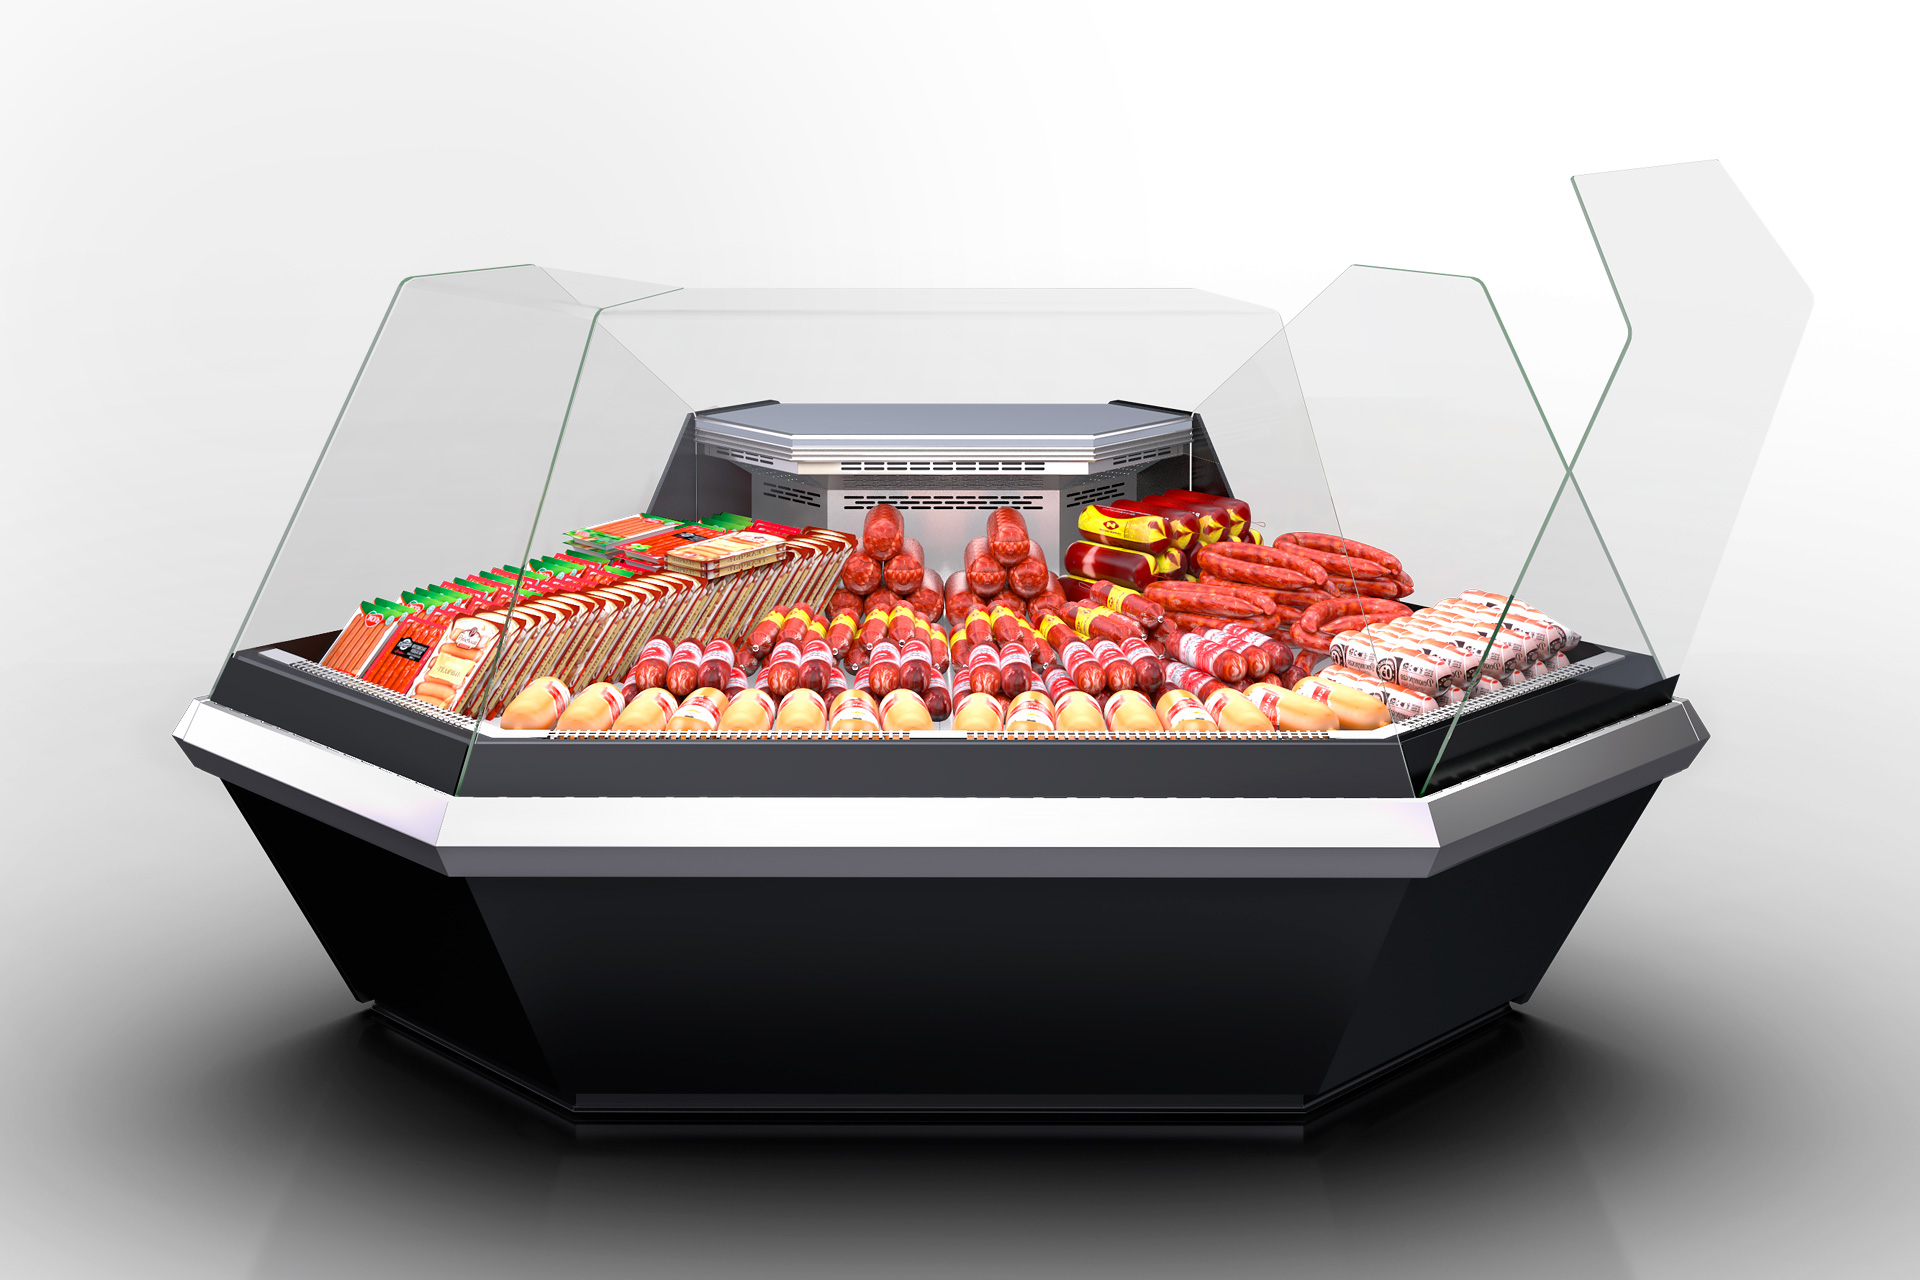 Angular elements of refrigerated counters Missouri enigma MK 120 deli OS-DLM-ES90